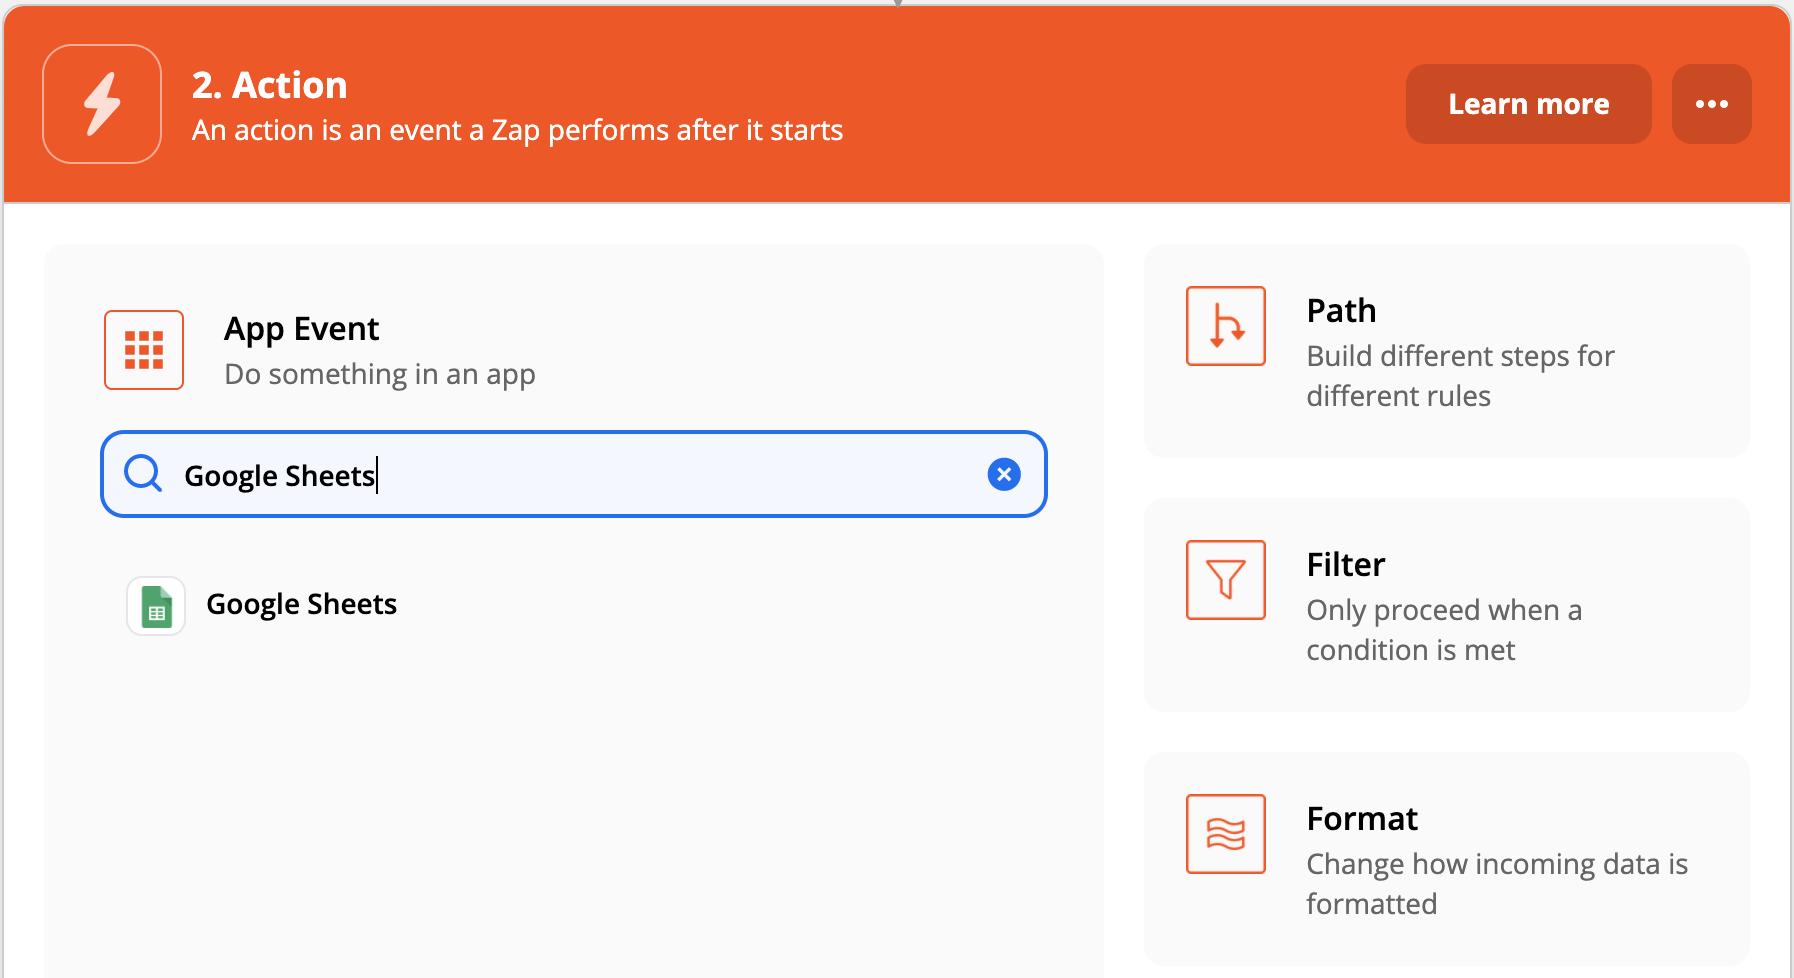 Action Zap Google Sheets